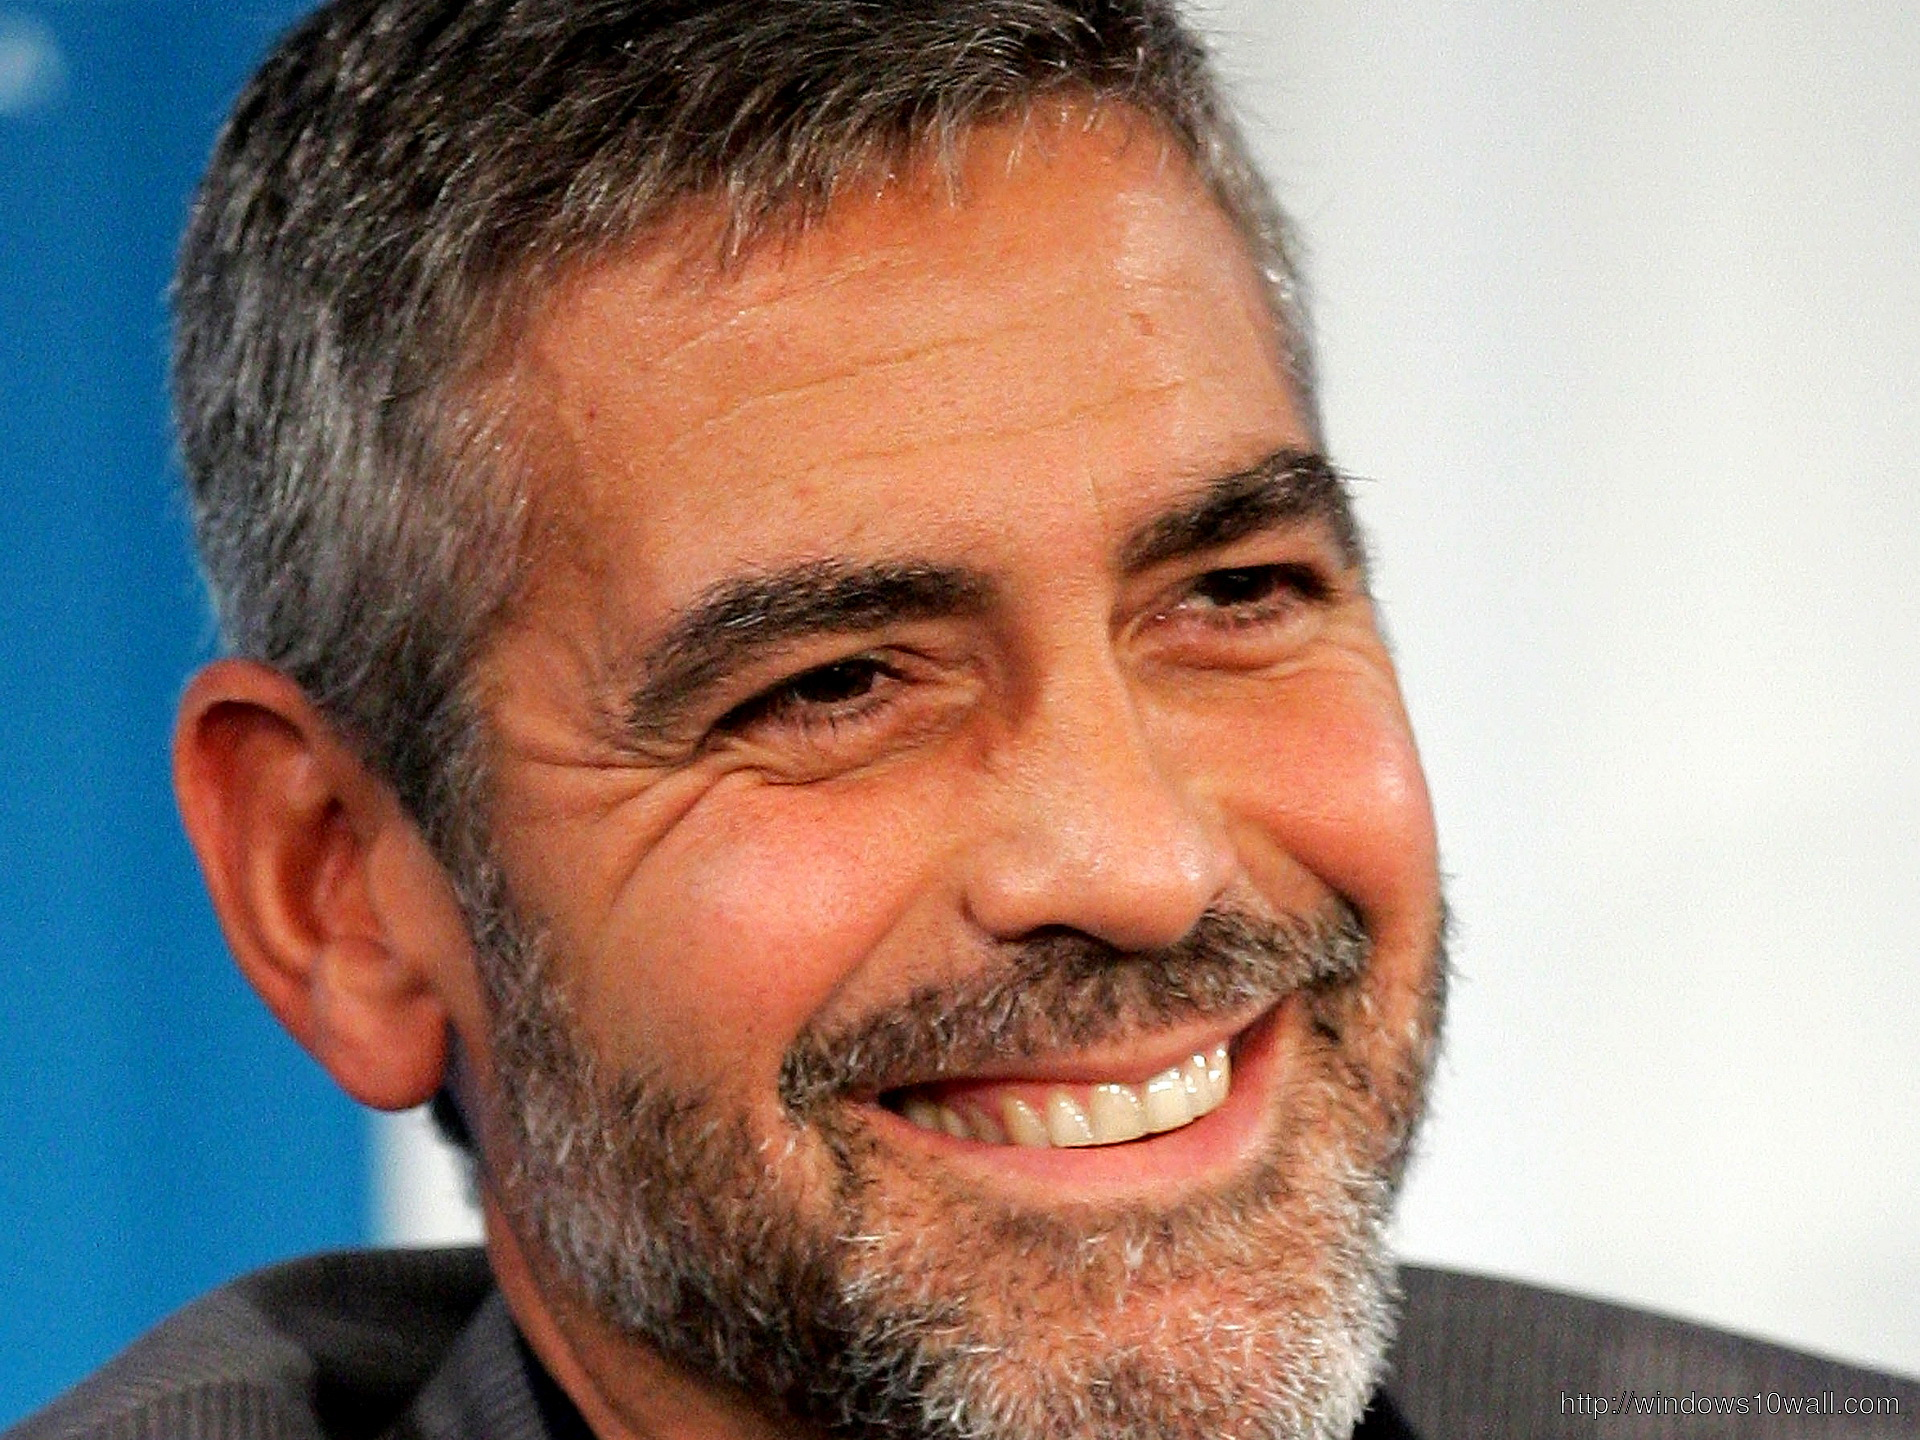 George Clooney Smiling Wallpaper